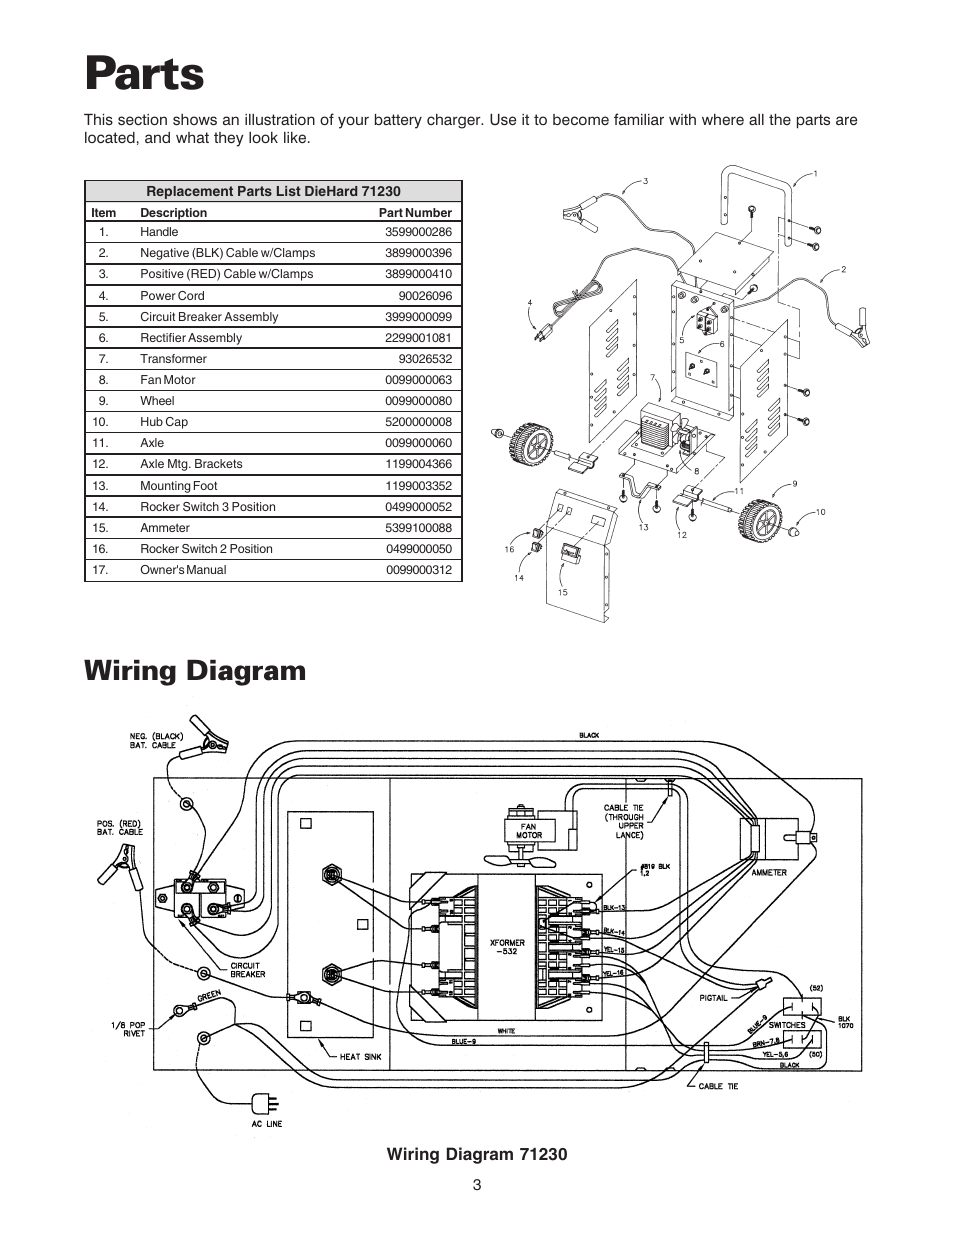 Diagram Battery Charger Schumacher 50 Amp Wiring Diagram Full Version Hd Quality Wiring Diagram Wirexyz Les Cafes Deric Orleans Fr